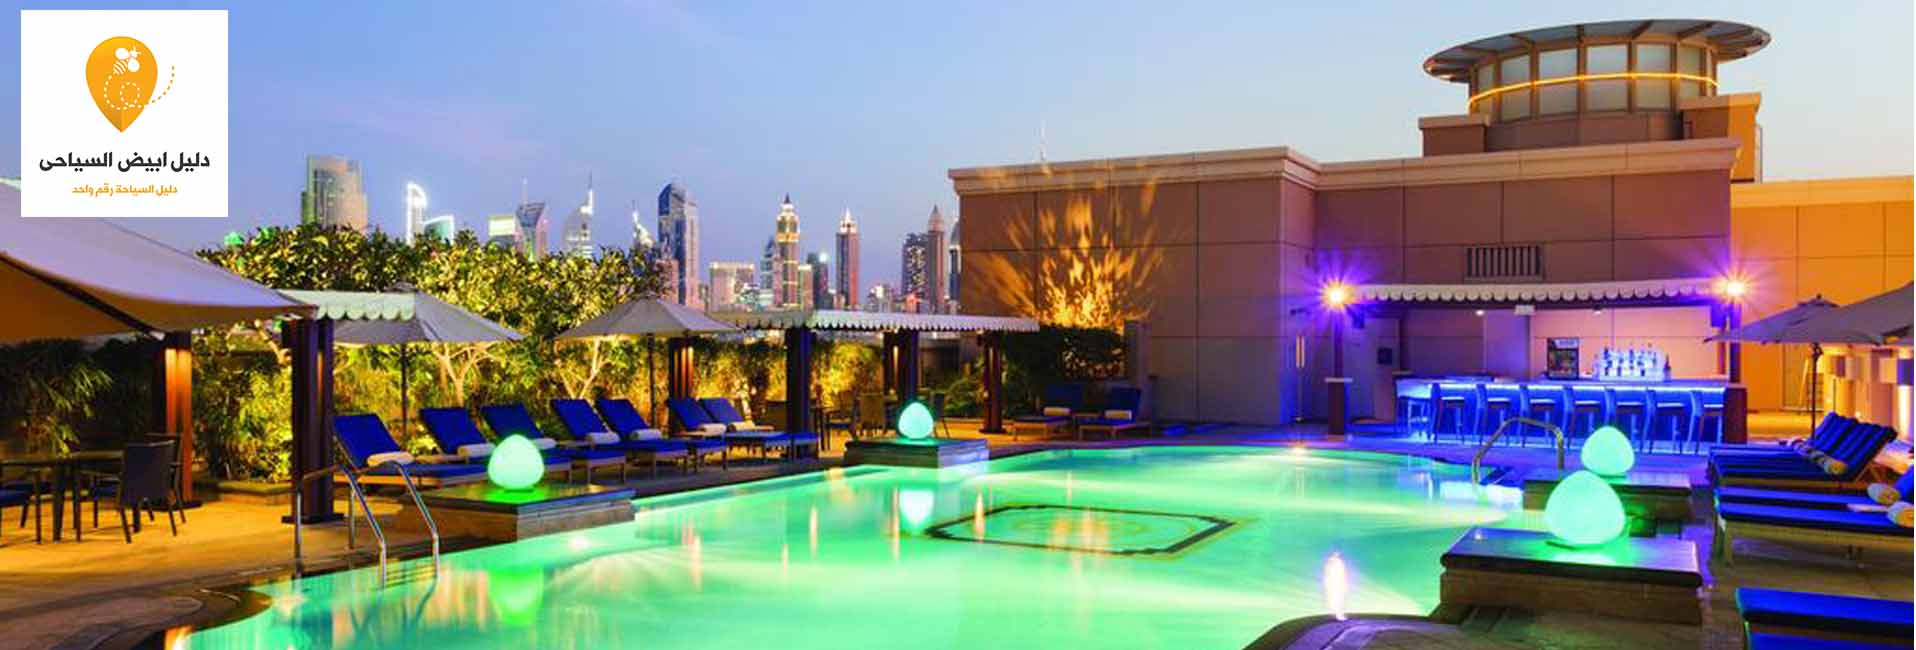 فندق رامادا جميرا دبي